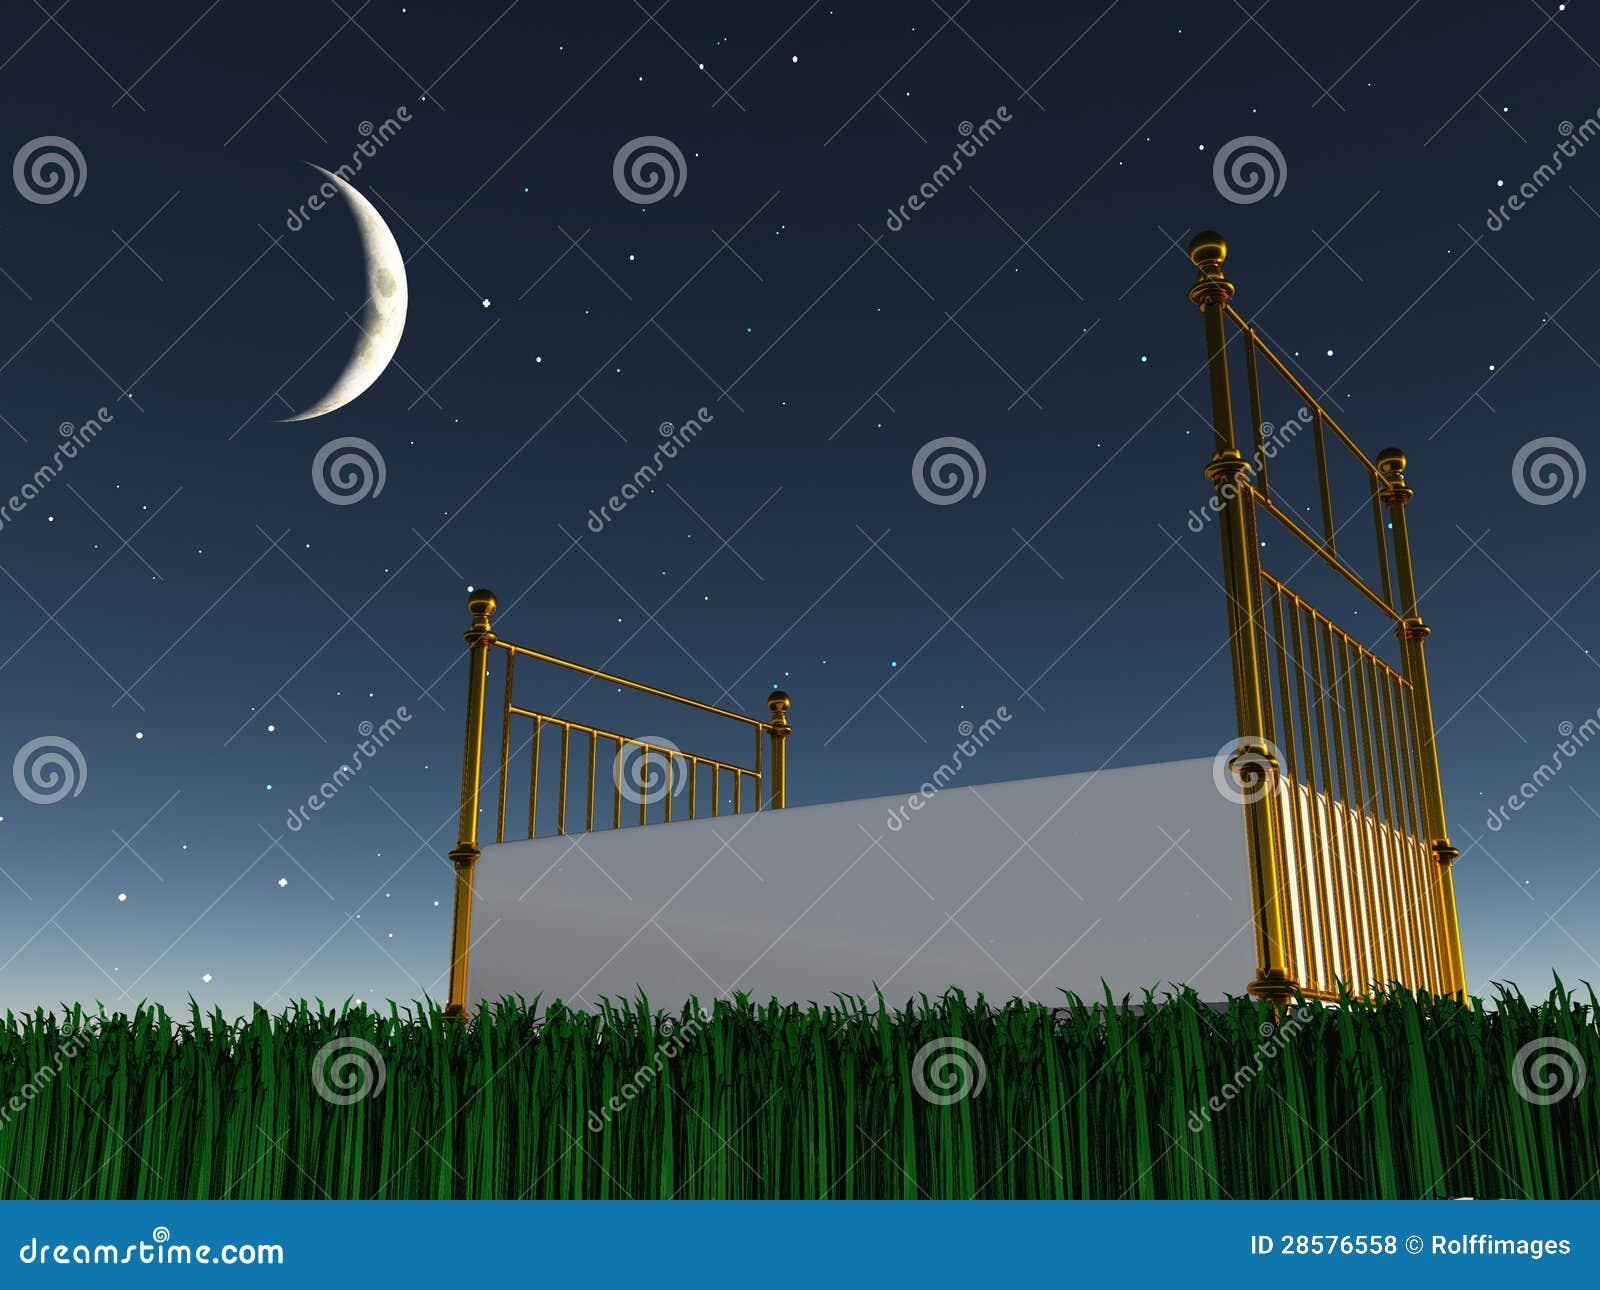 http://thumbs.dreamstime.com/z/b%C3%A2ti-sous-les-%C3%A9toiles-28576558.jpg